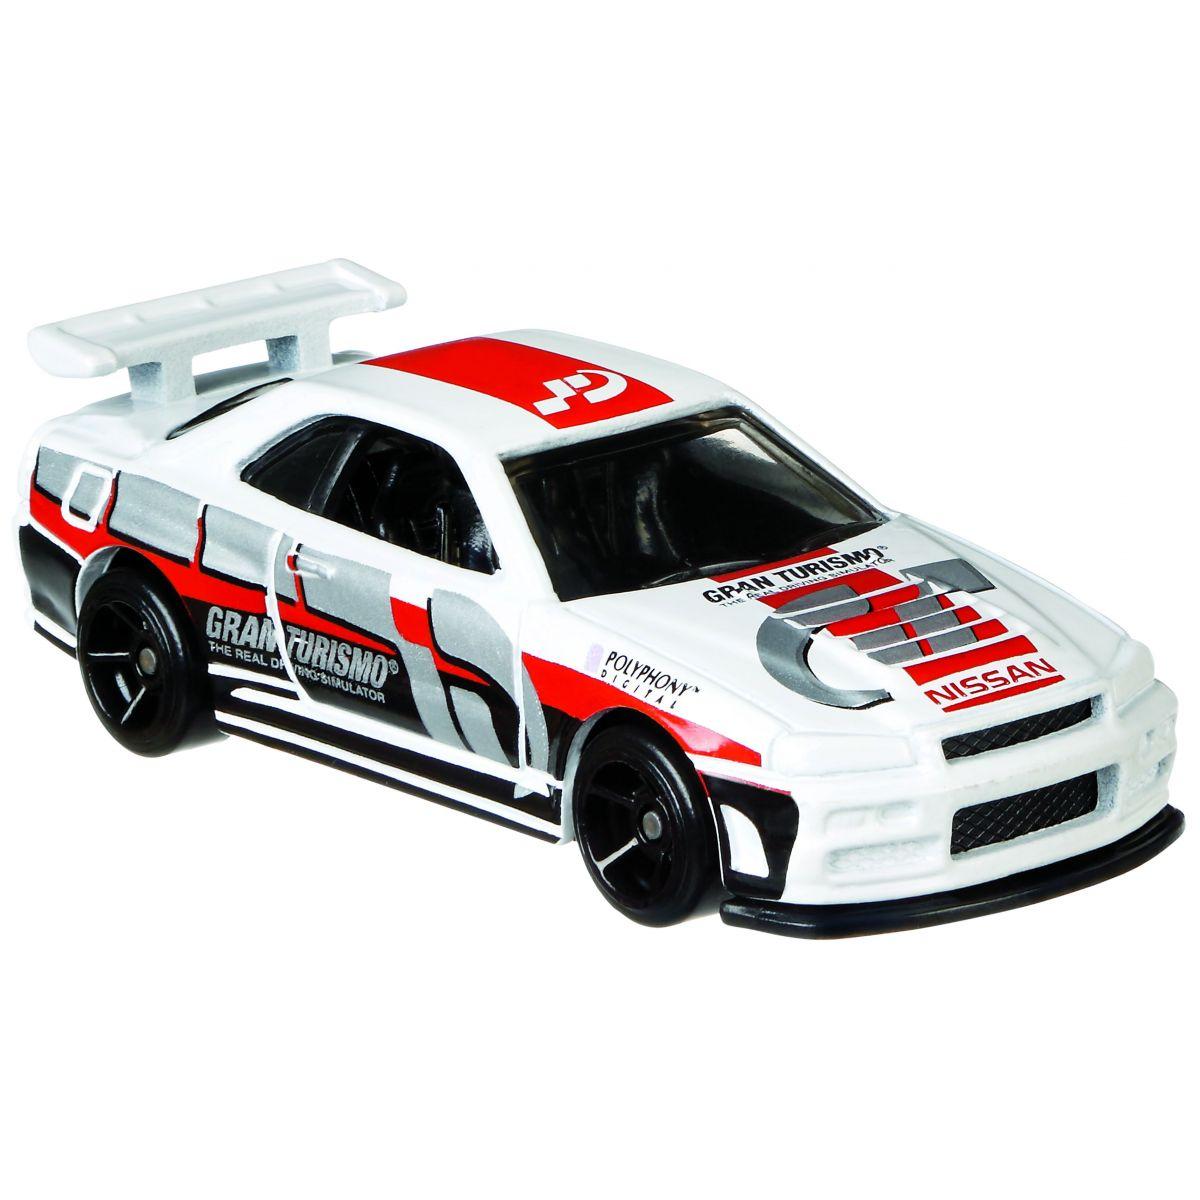 Hot Wheels Gran Turismo Tématické auto Nissan Skyline GT-R